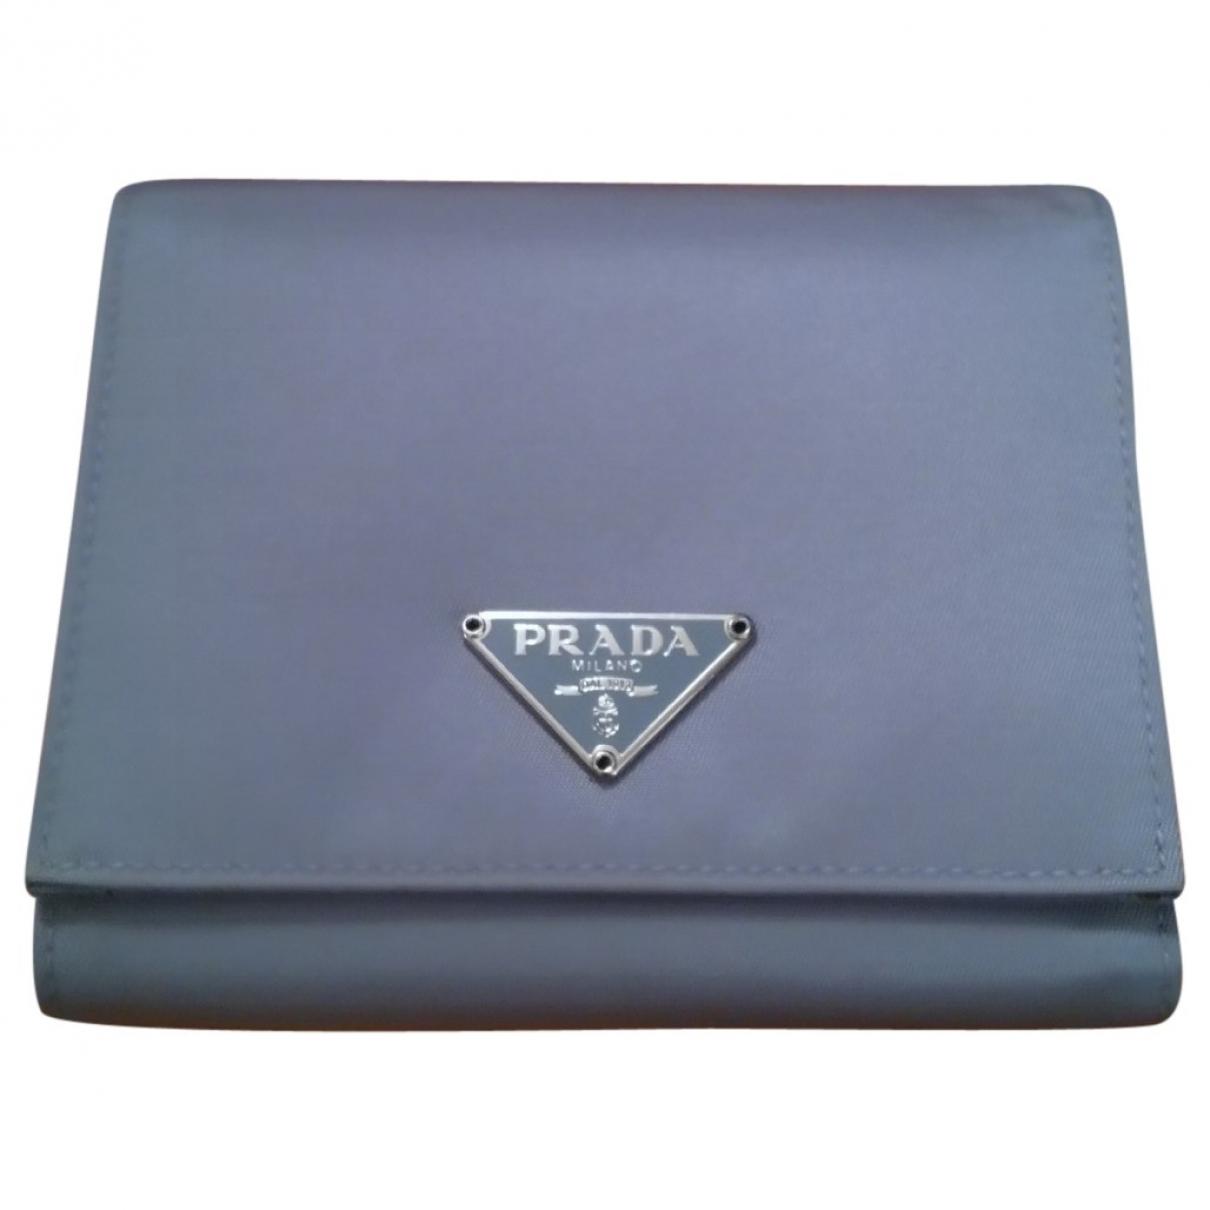 Prada - Portefeuille   pour femme en toile - turquoise